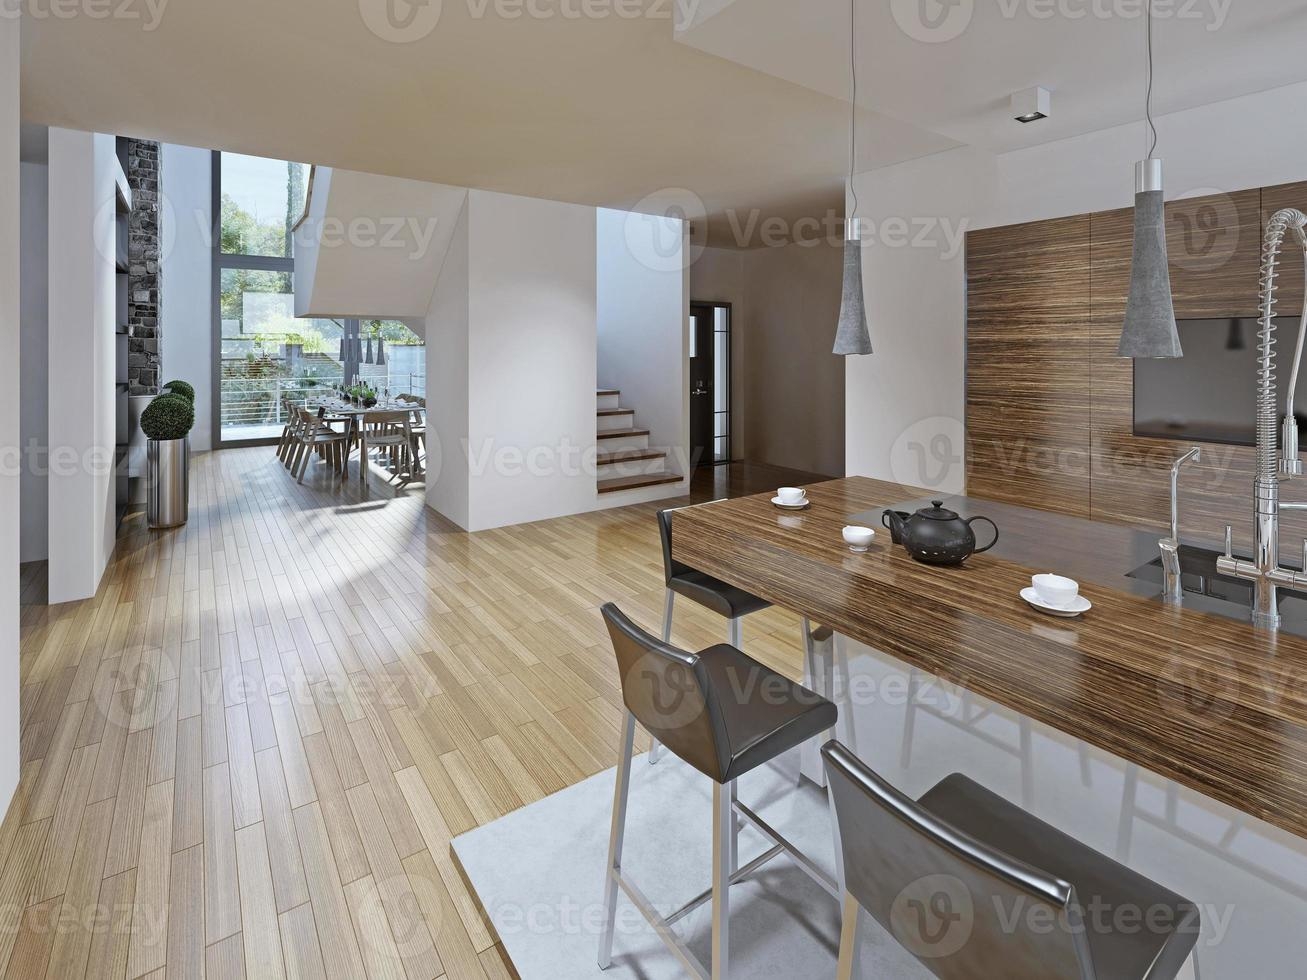 cucina in stile high-tech con sala da pranzo foto